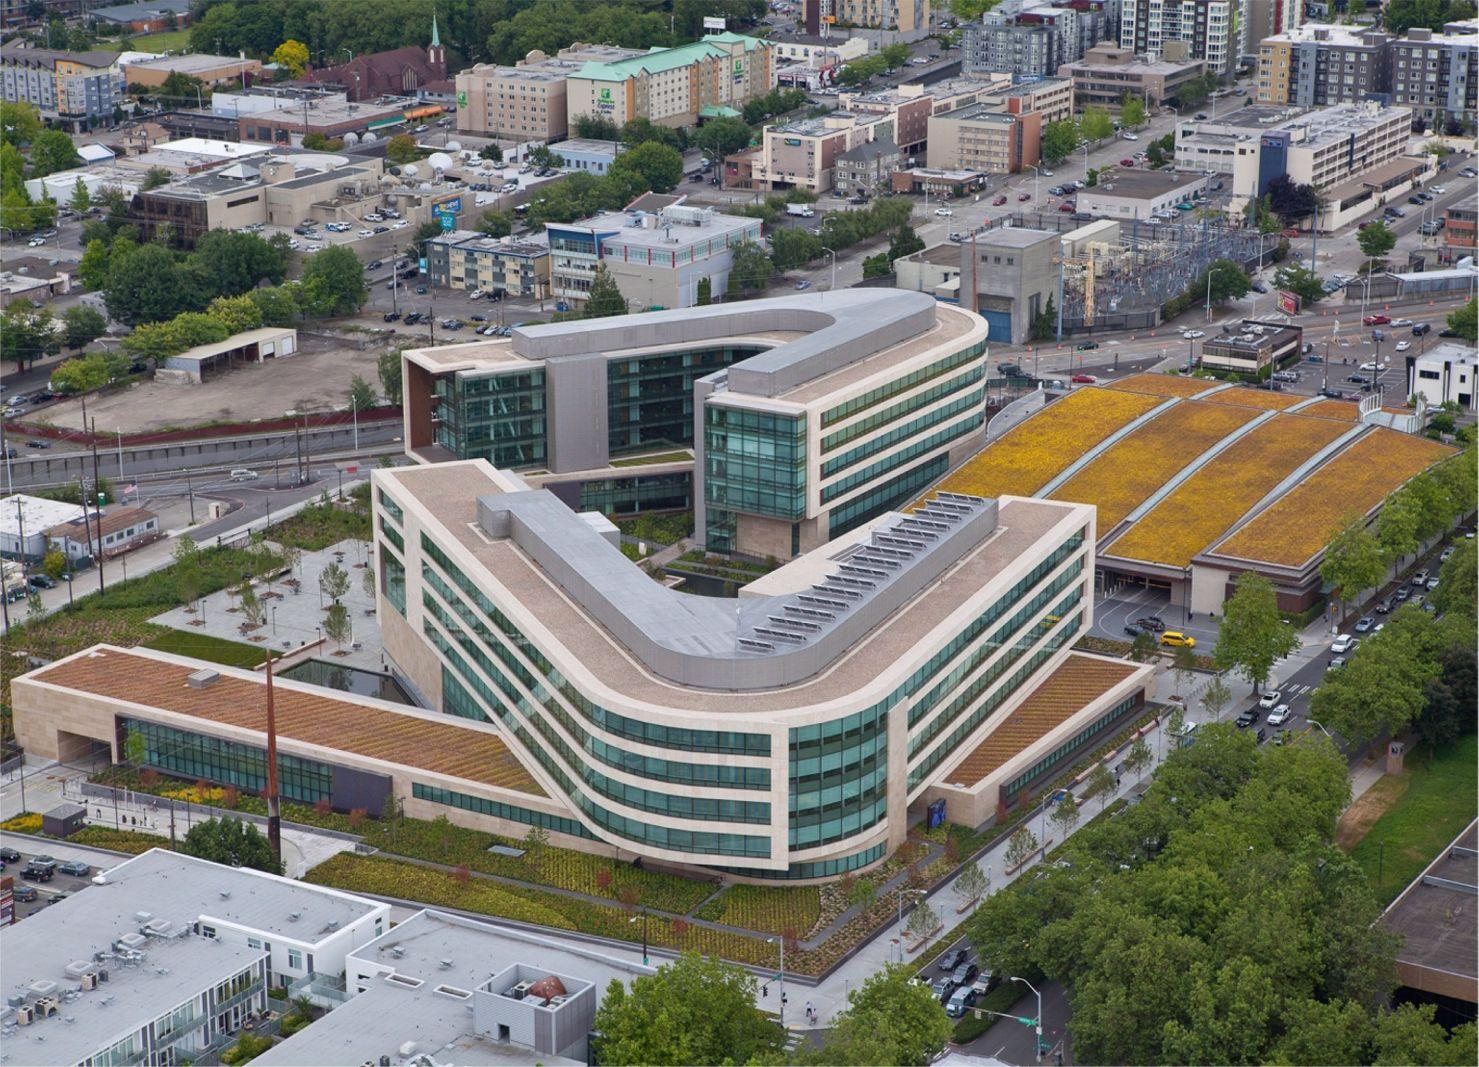 Bill & Melinda Gates Foundation & Seattle Center 5th Avenue North Parking Garage Featured Image